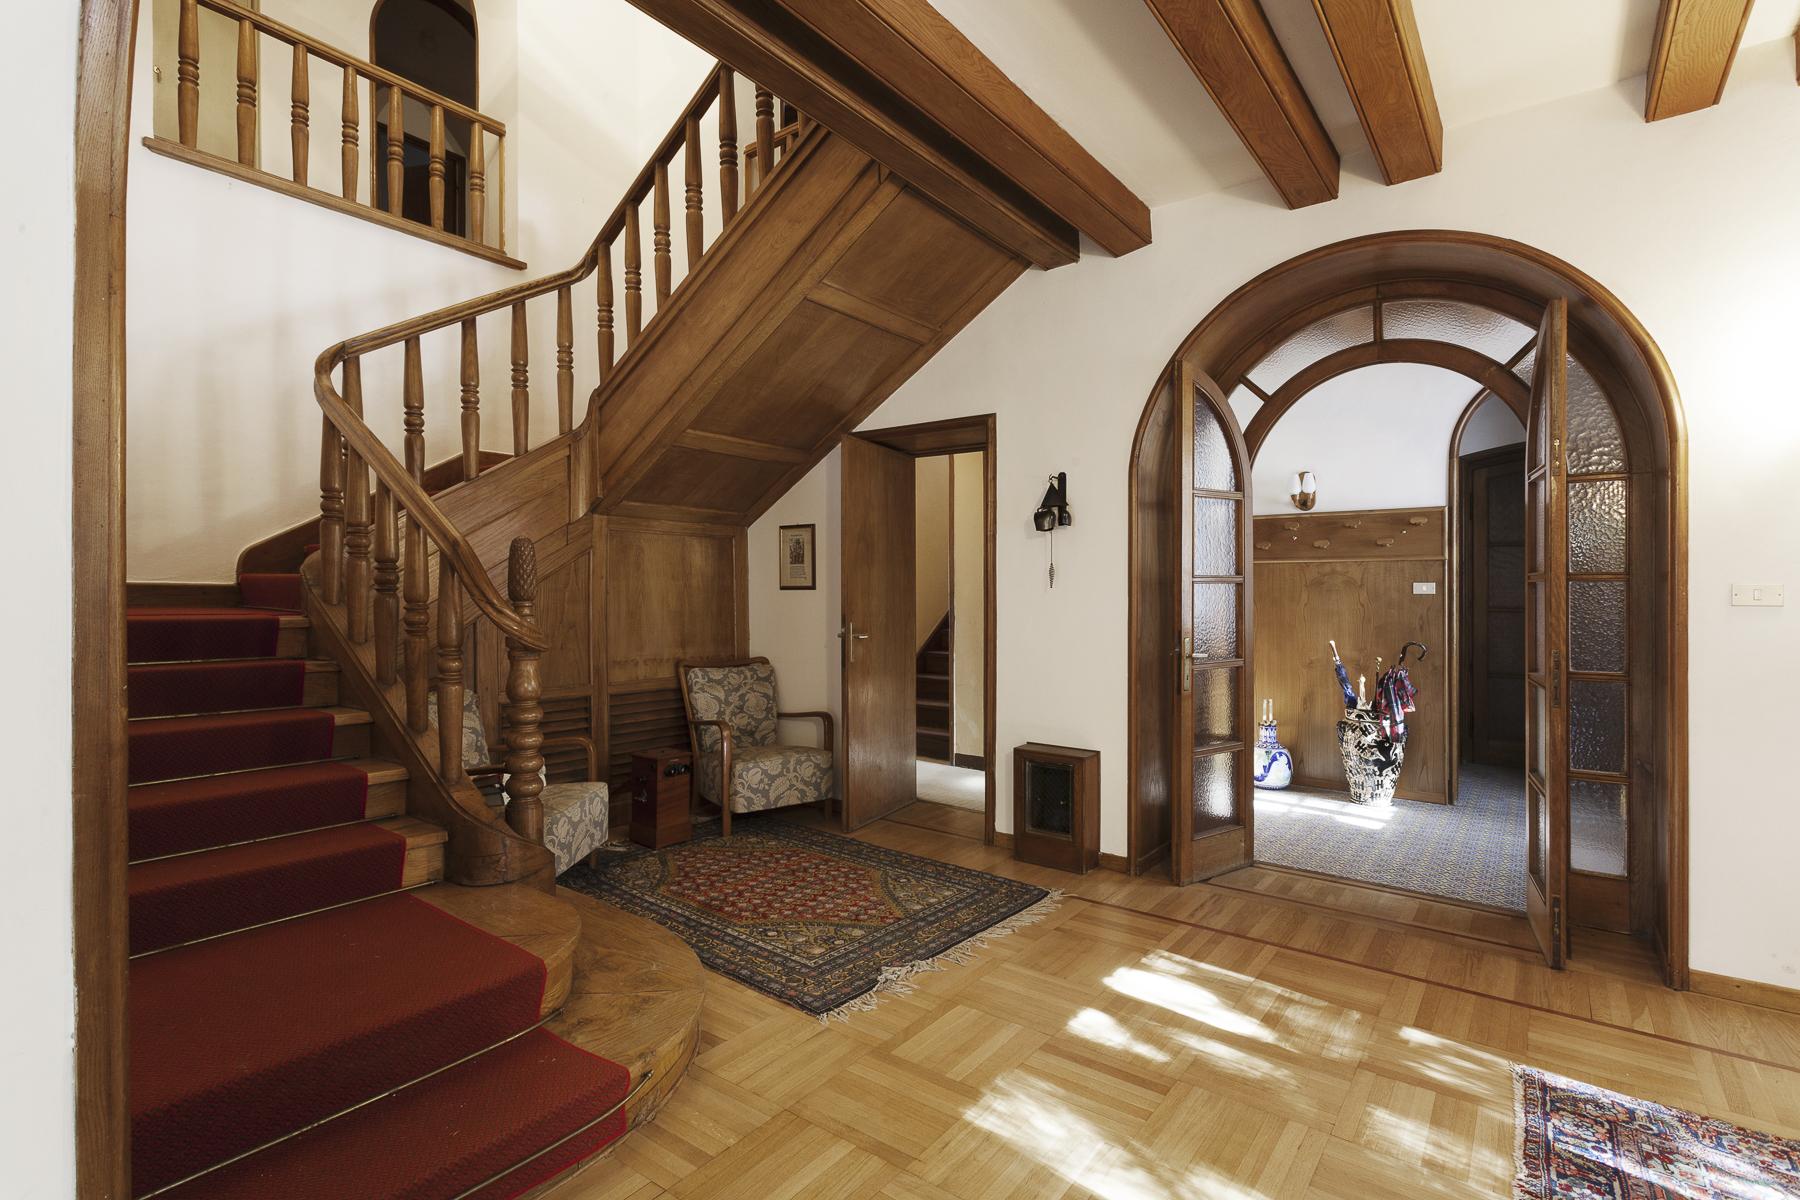 Villa in Vendita a Courmayeur: 5 locali, 1230 mq - Foto 2